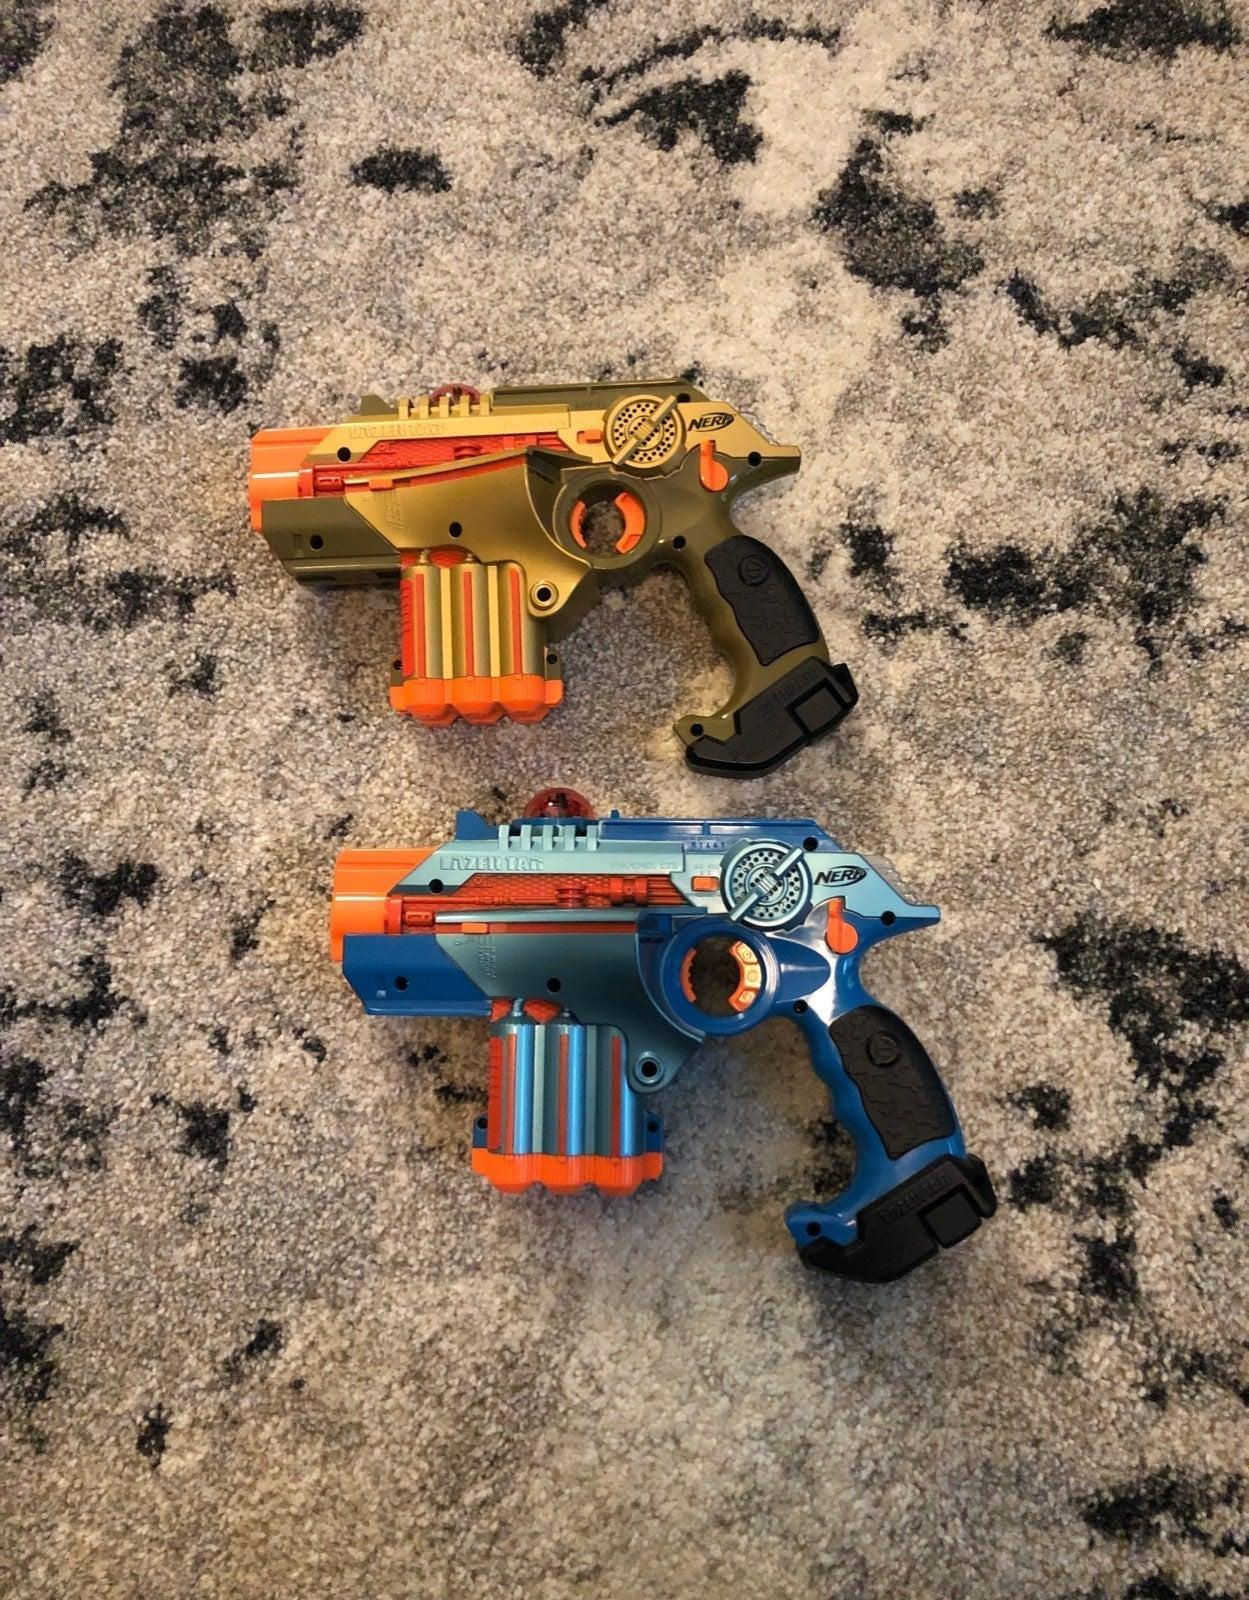 Nerf Phoenix LTX laser tag guns